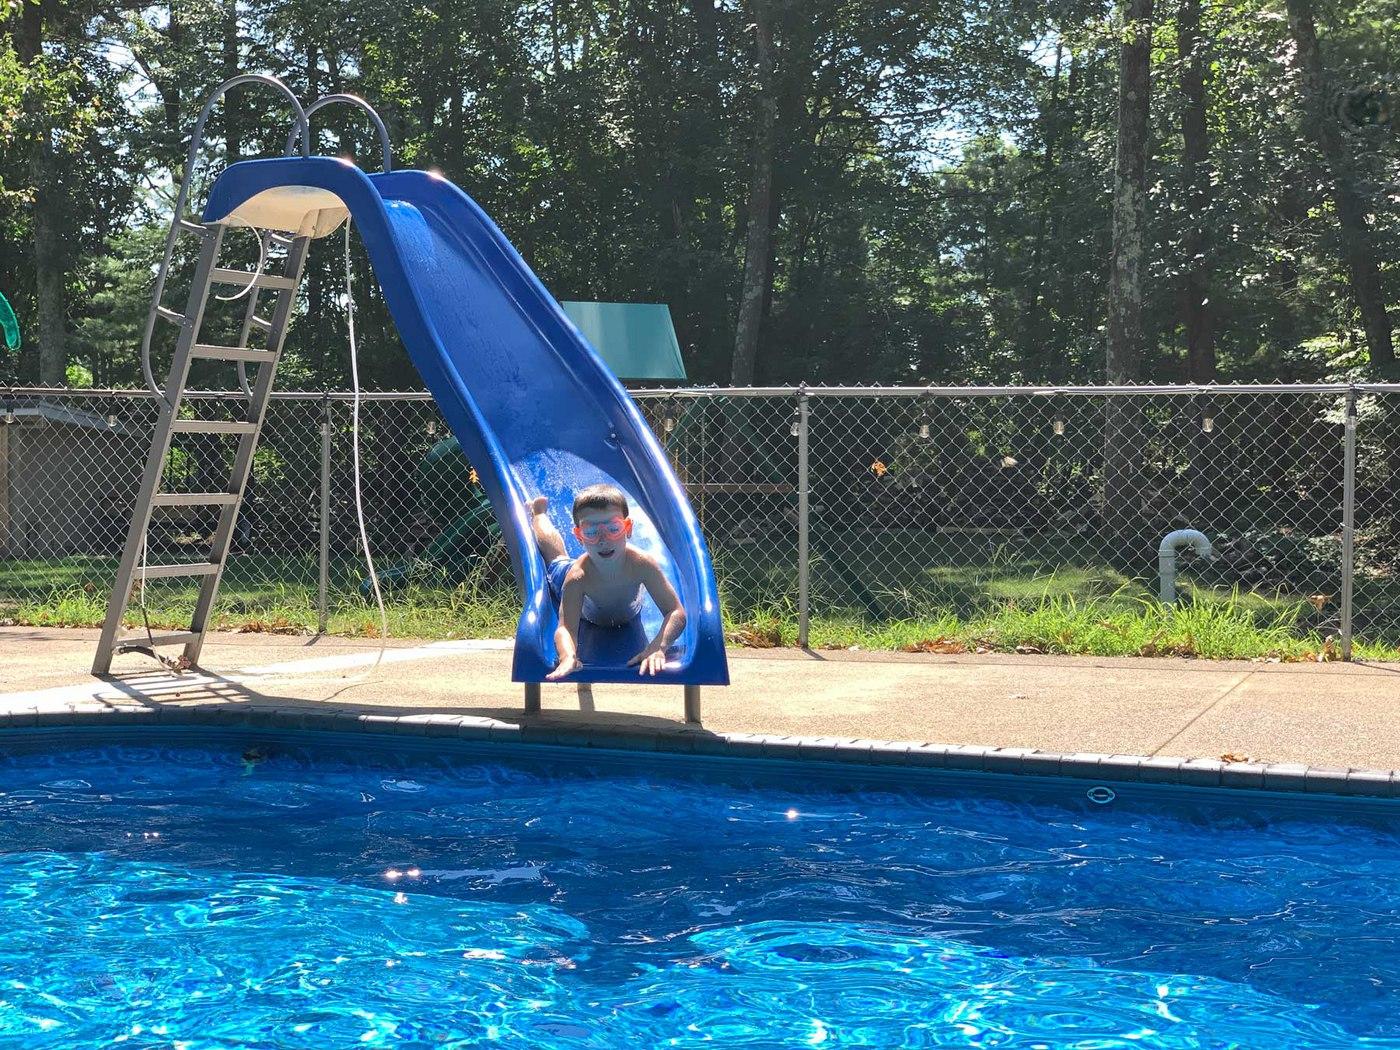 Umbrella-Insurance-Swimming-Pool-Slide